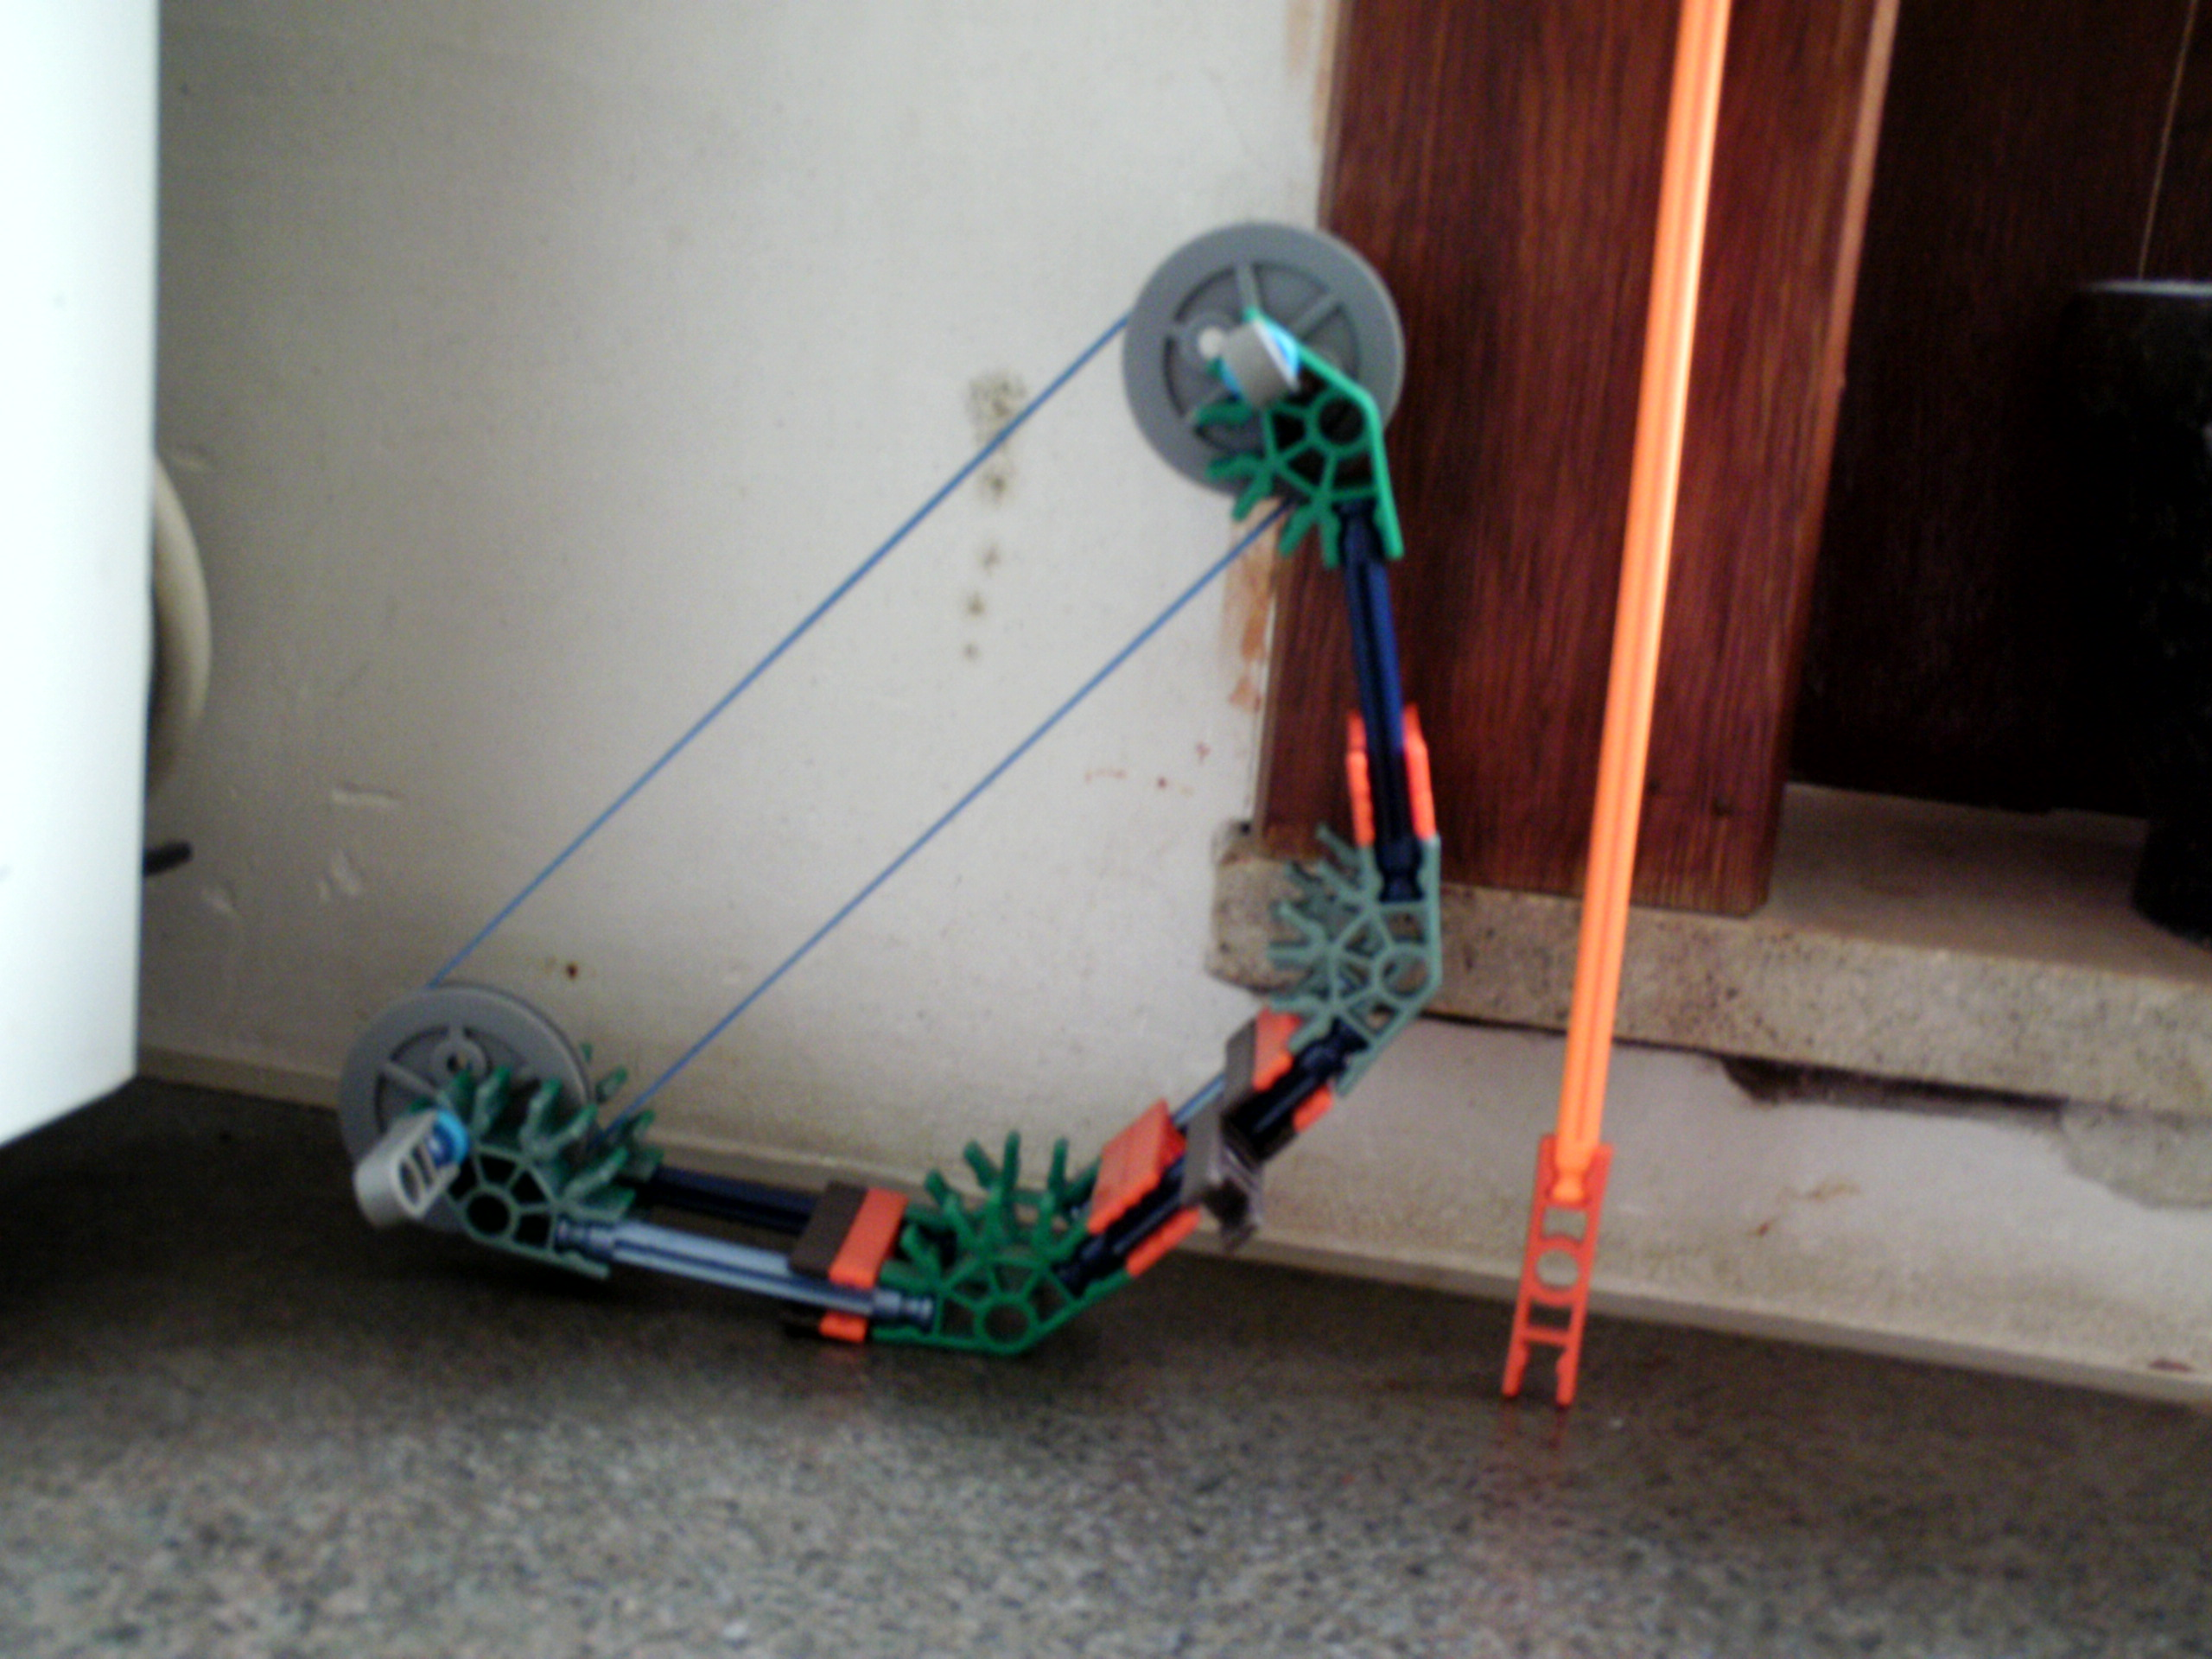 Knex mini-bow